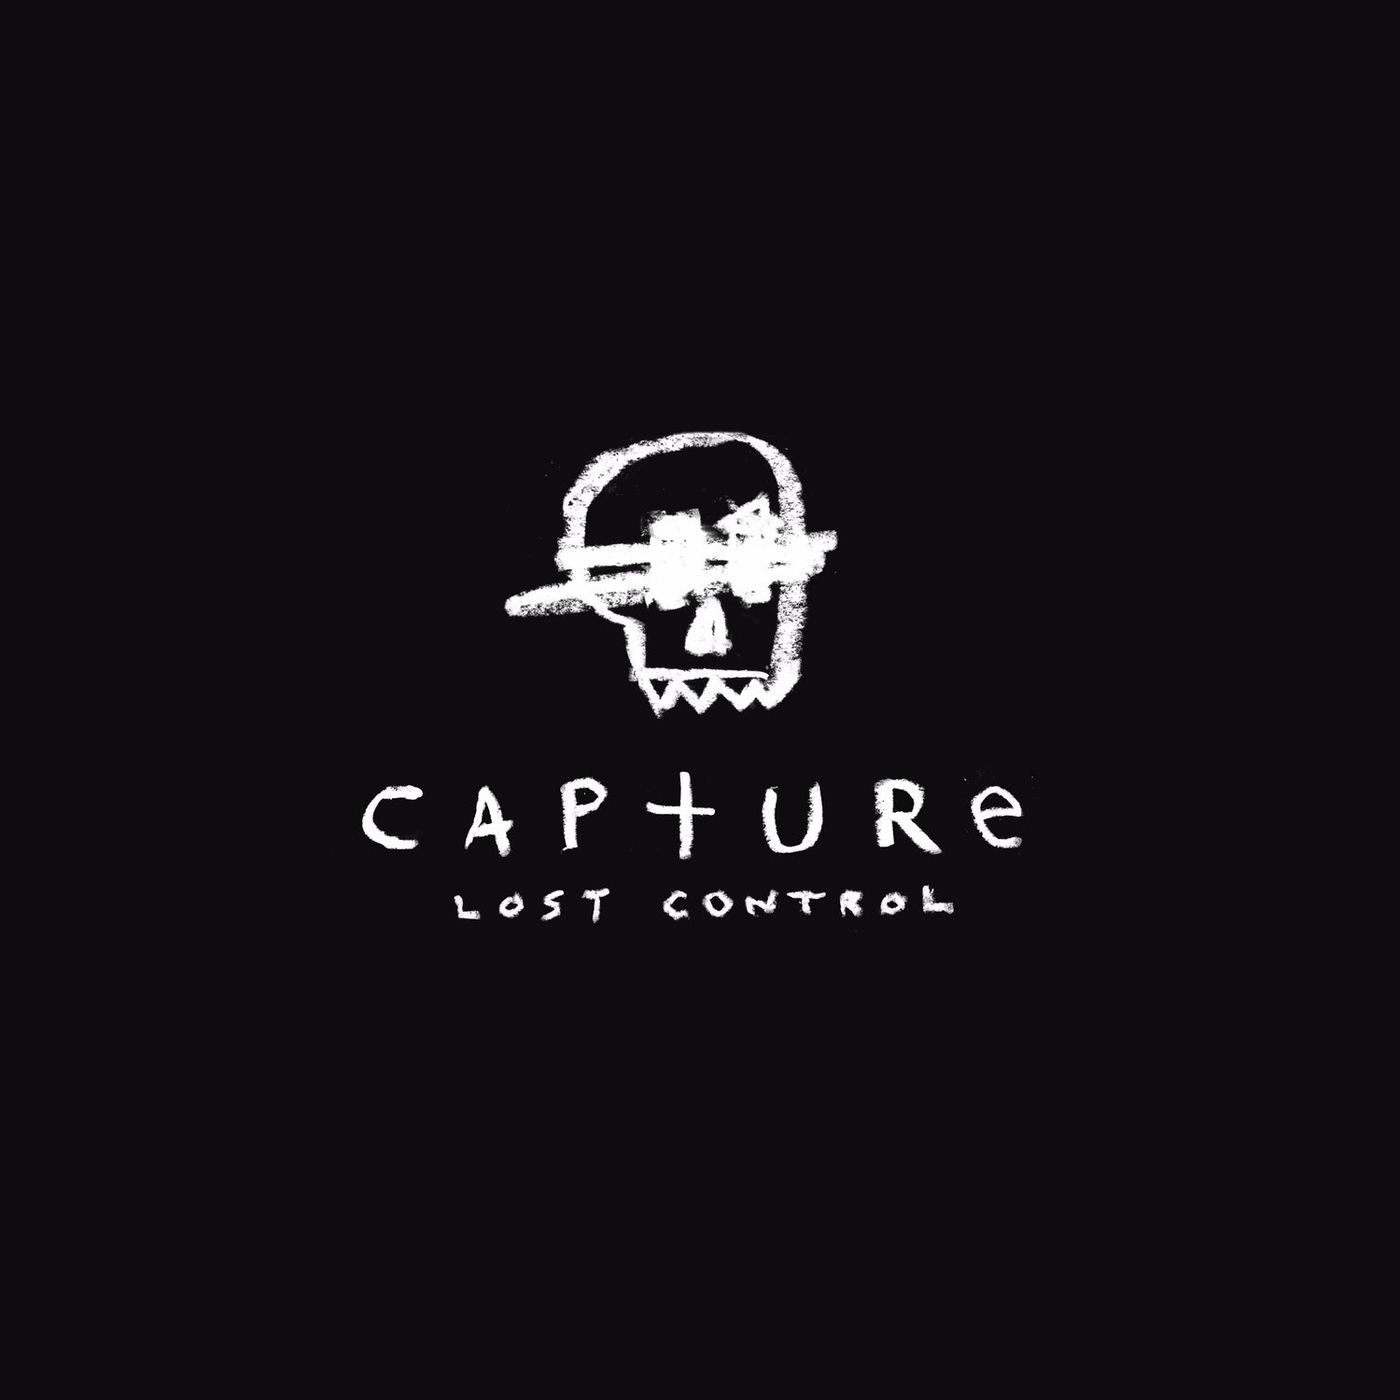 Capture - Lost Control [single] (2017)